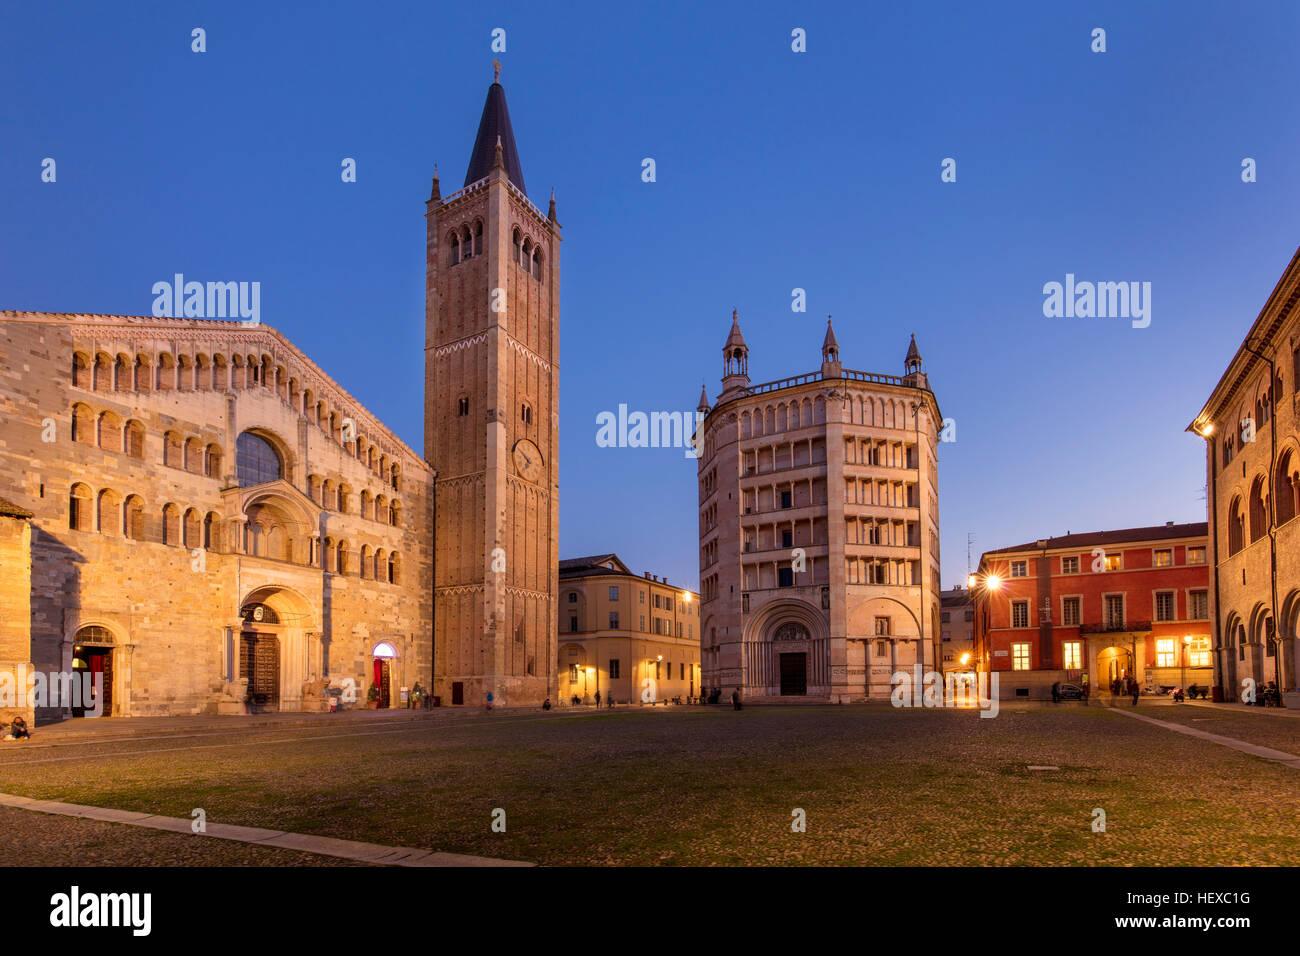 Twilight over the Duomo and Baptistery, Parma, Emilia-Romagna, Italy - Stock Image